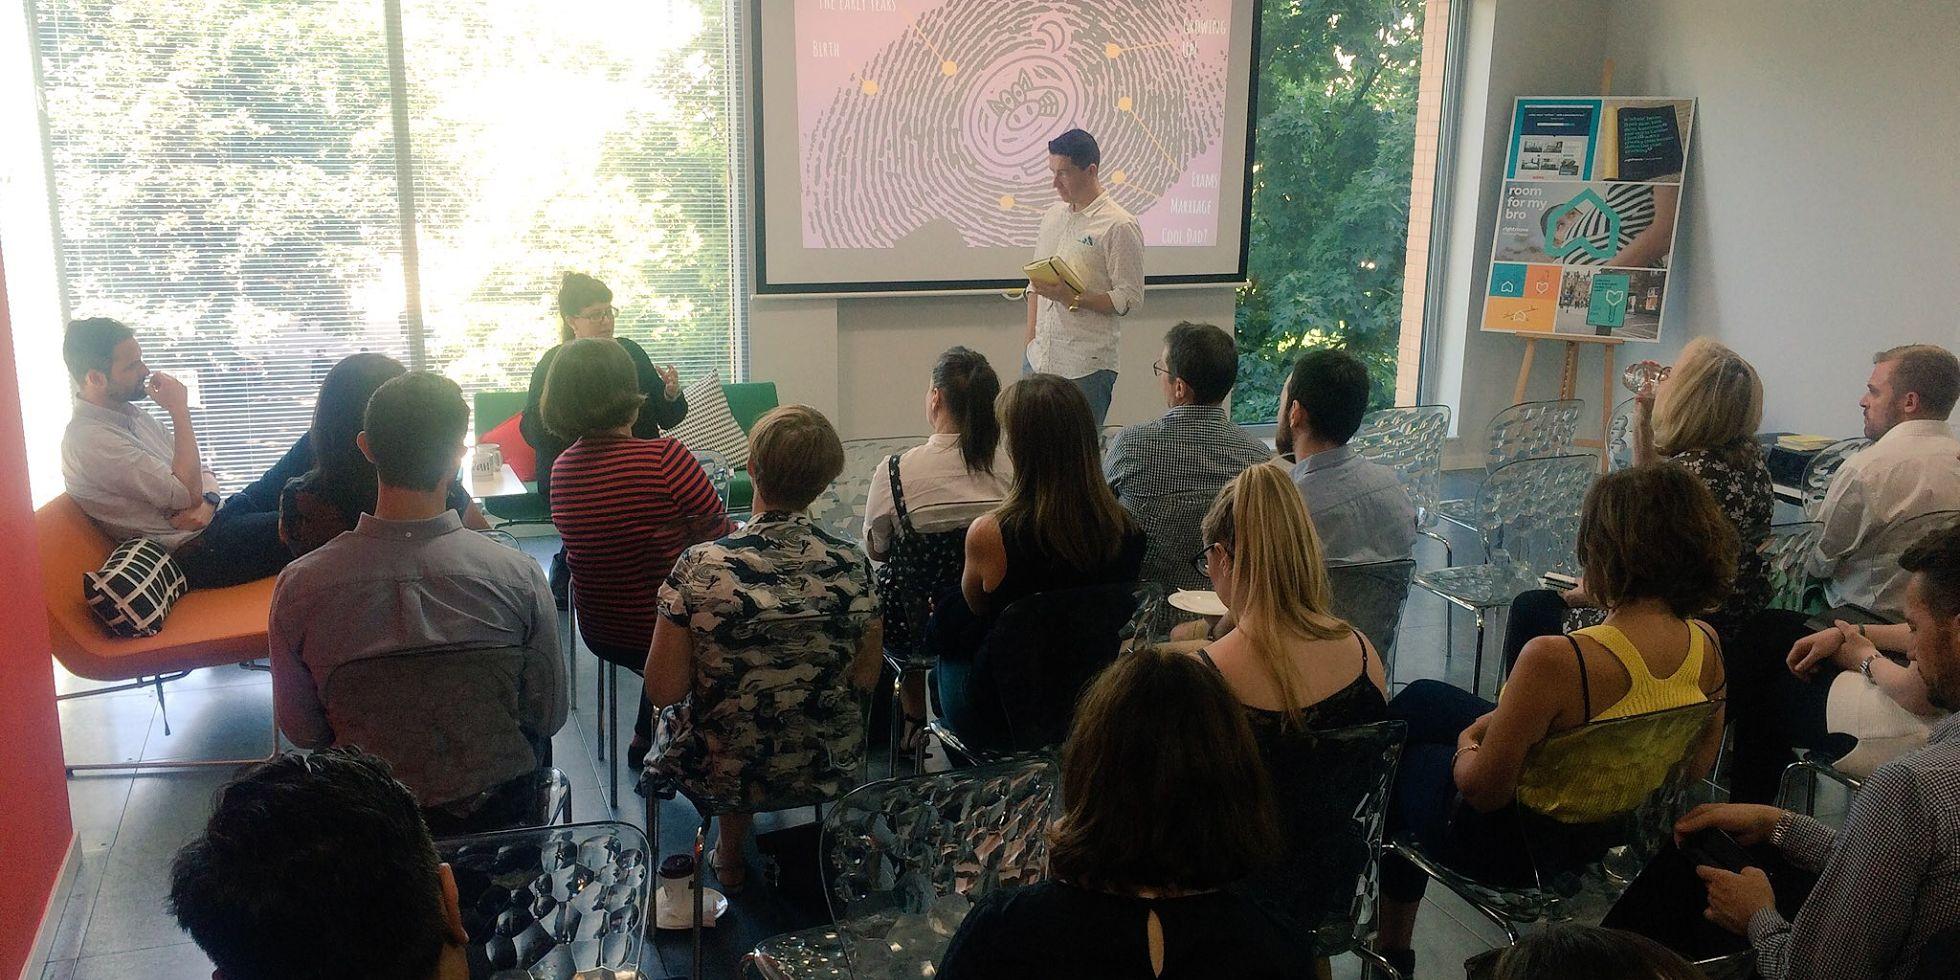 event, brand purpose, brand purpose learning event